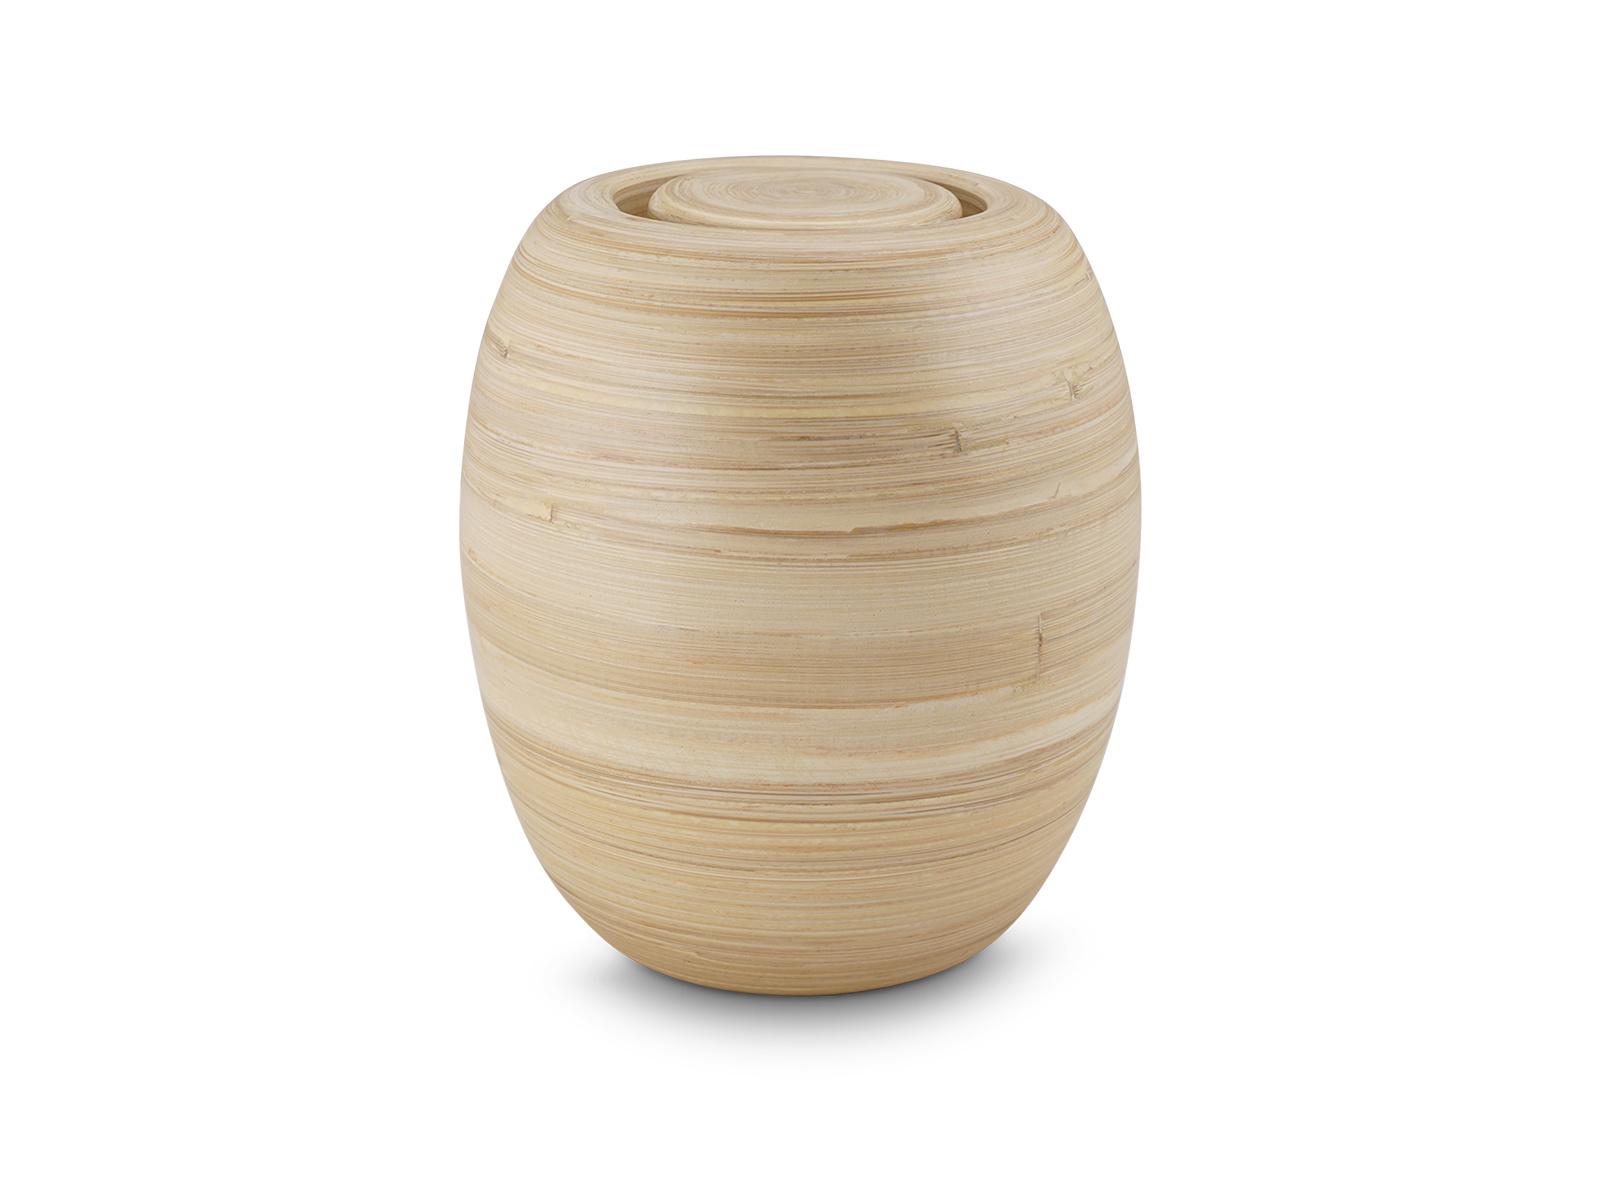 Bakka bamboe urn middel - hout